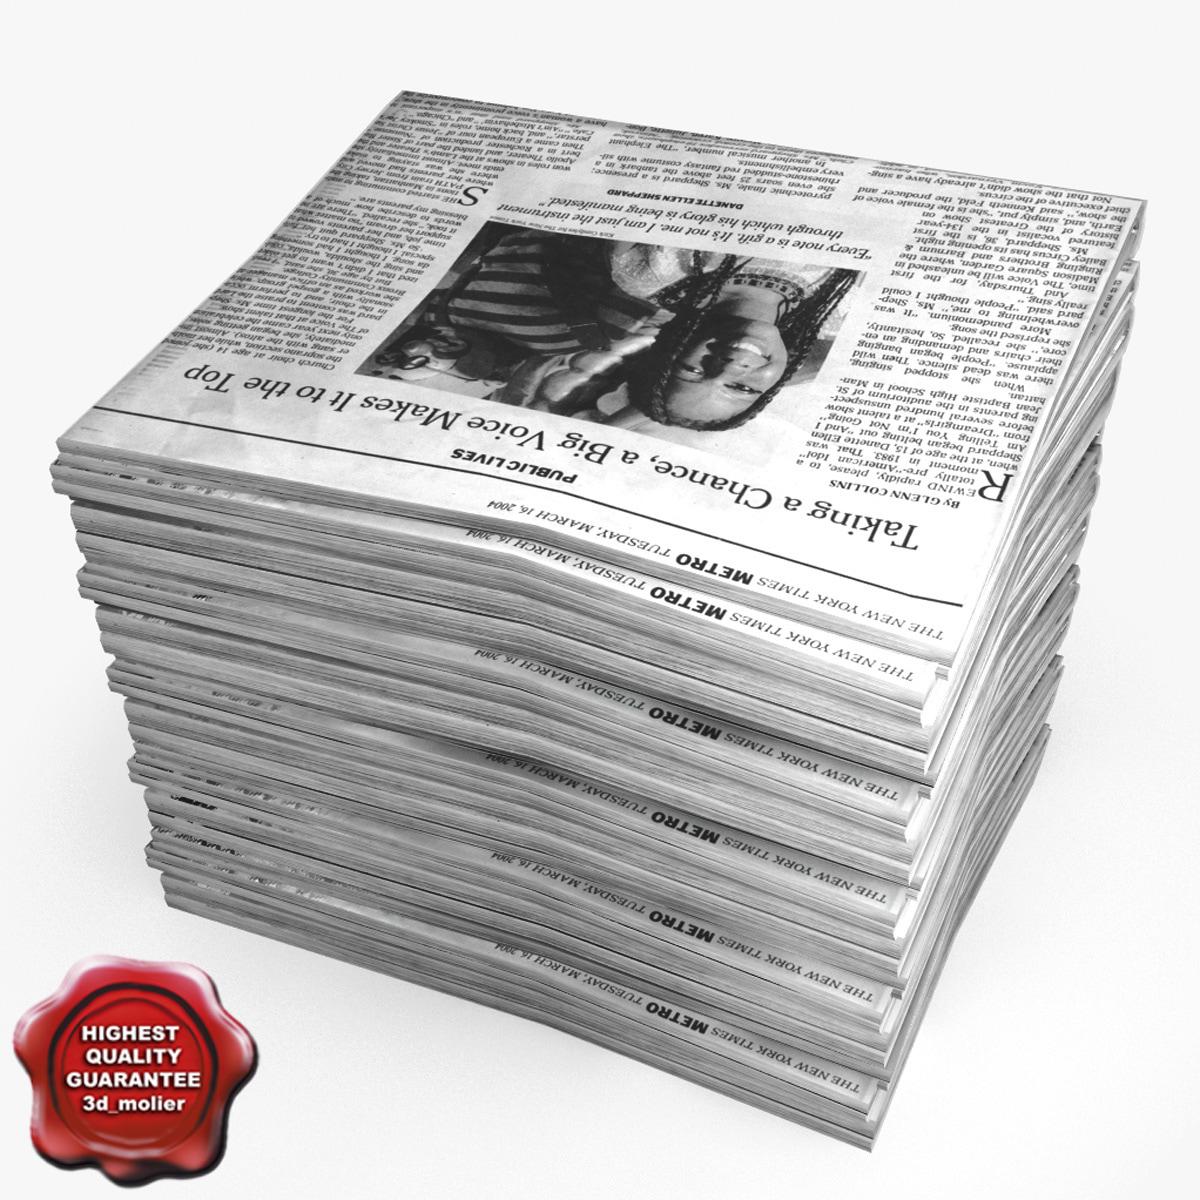 Newspapers_V6_00.jpg